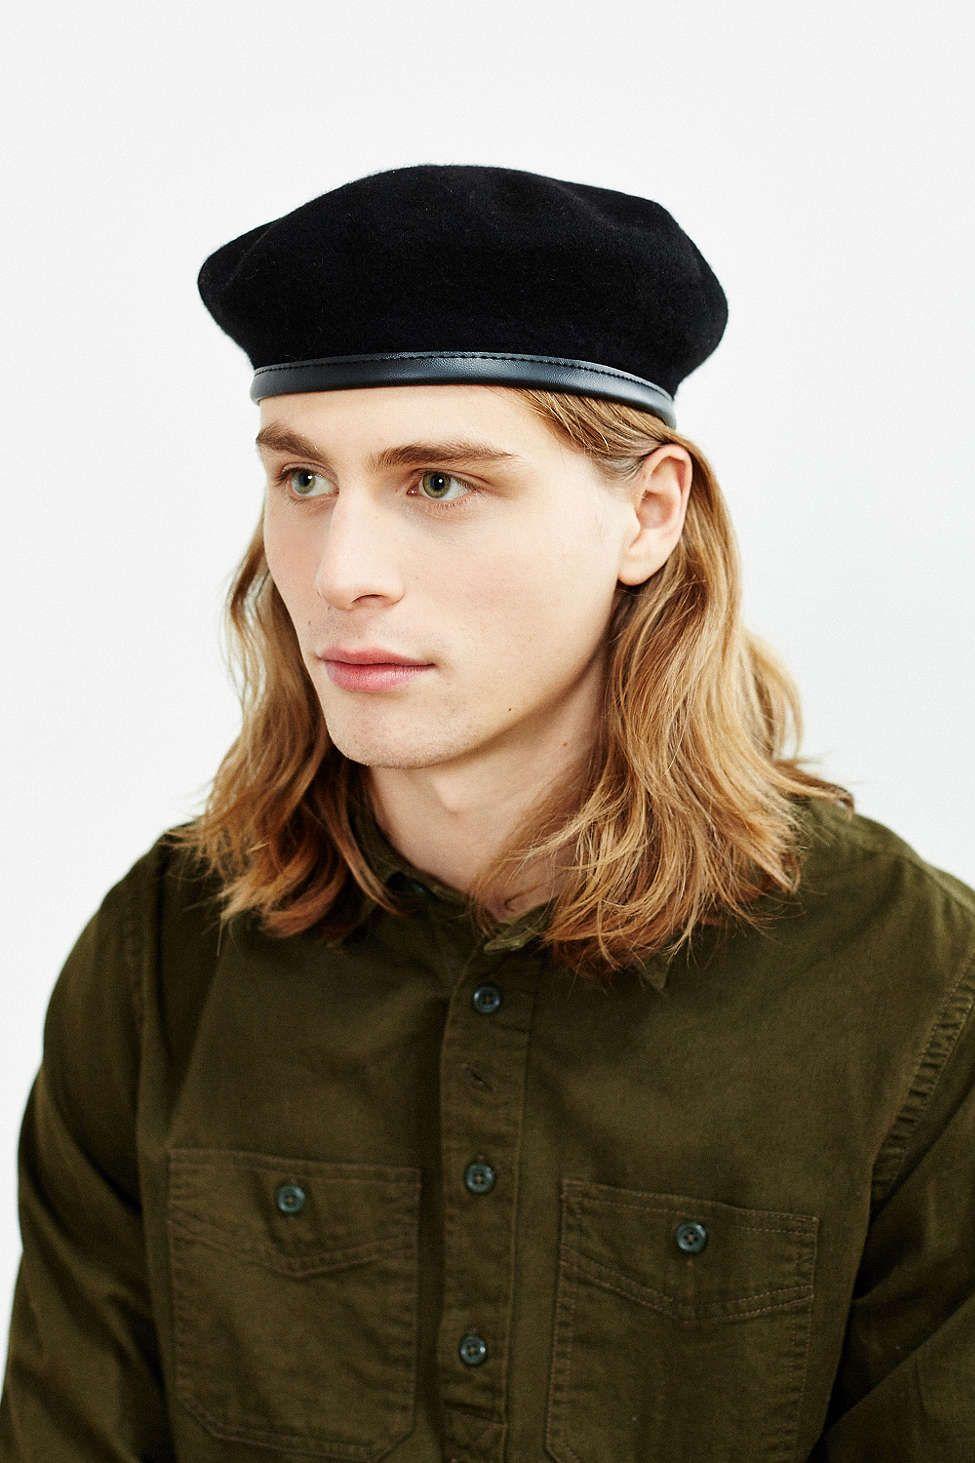 47c2886b4a62b Rothco Military Beret Mens Beret Hat